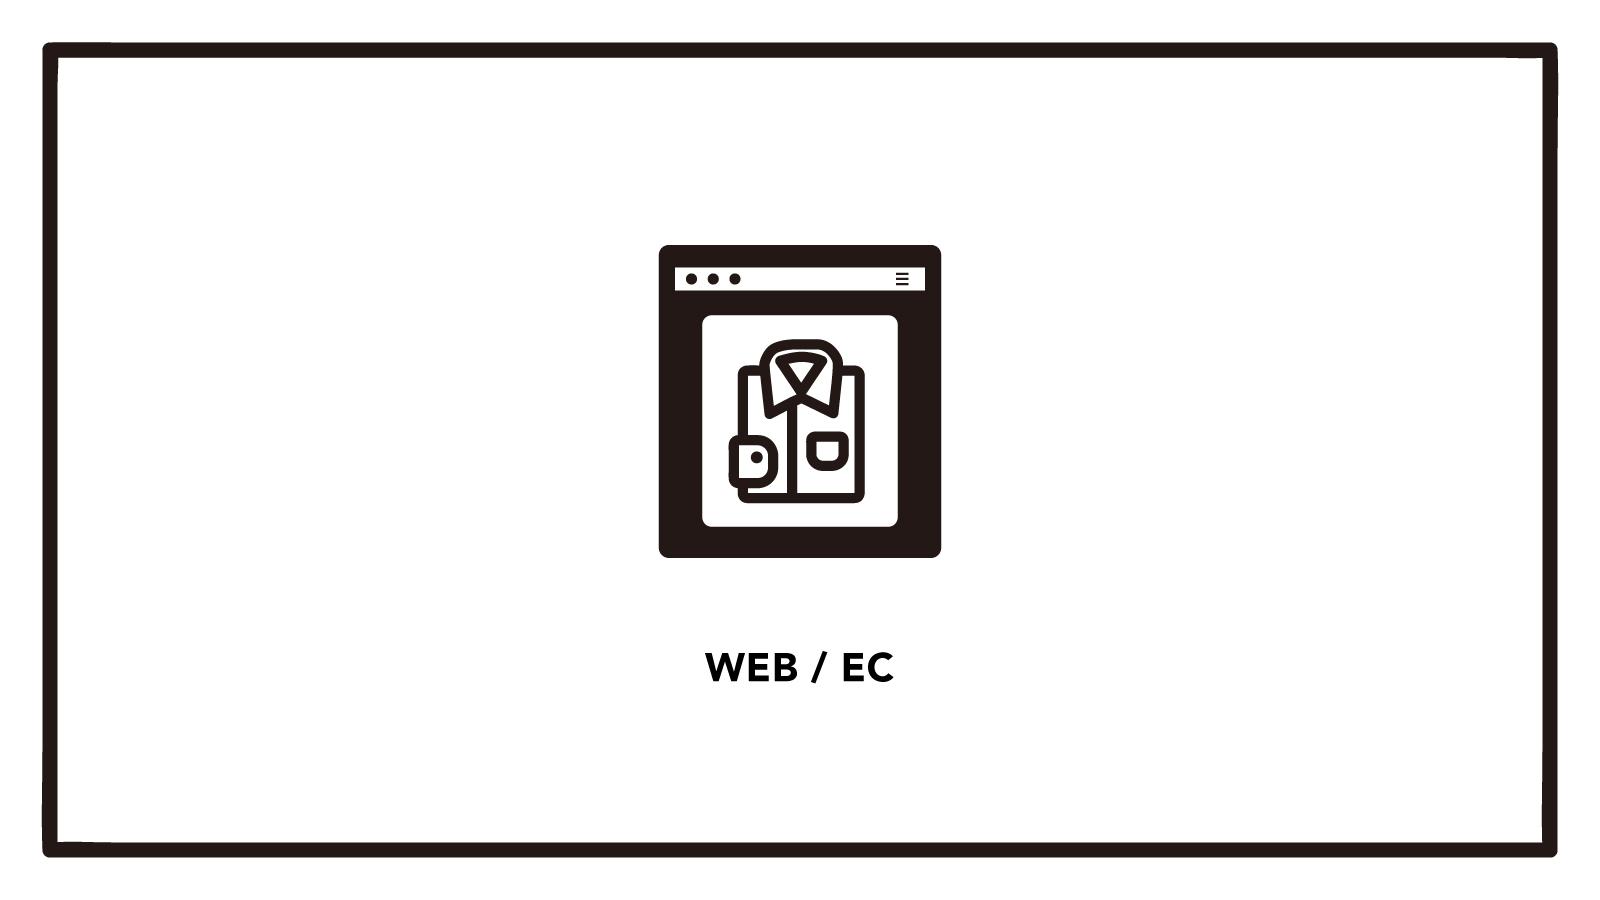 <WANTED>バックオフィスに携わる職種の方 経理、財務、事務...◎のカバー写真